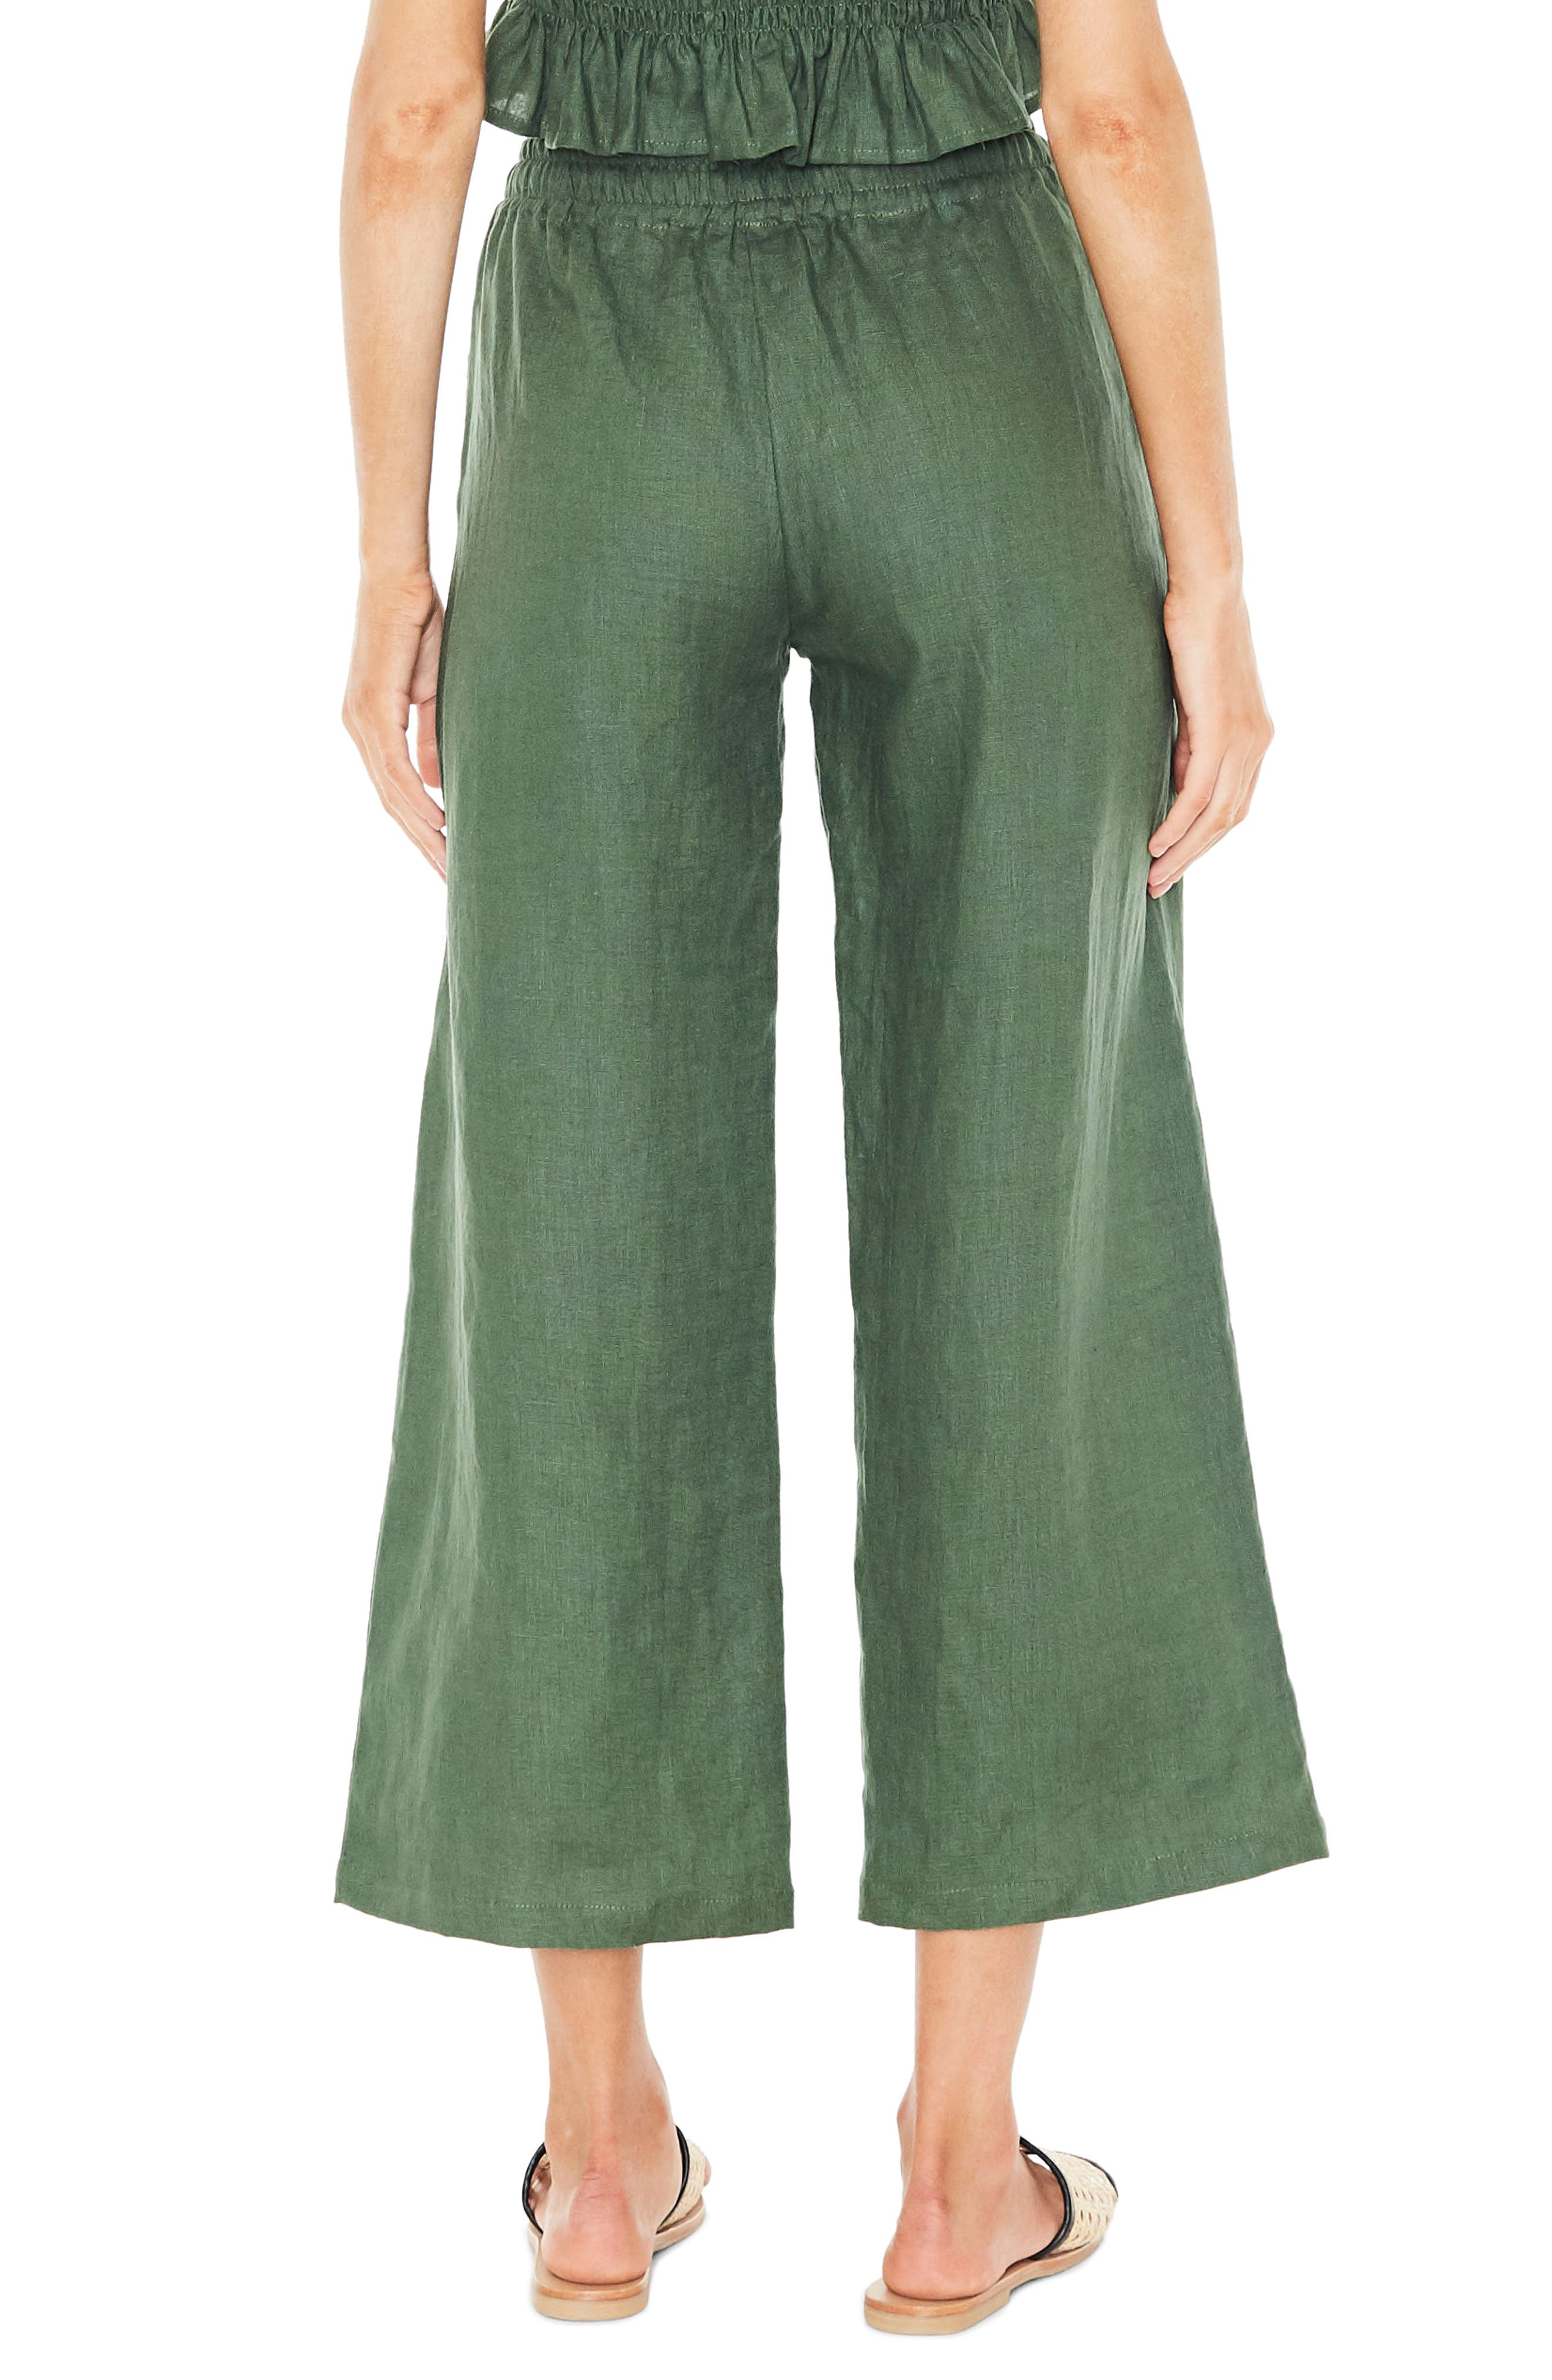 Clemence Linen Pants,                             Alternate thumbnail 2, color,                             PLAIN MOSS GREEN